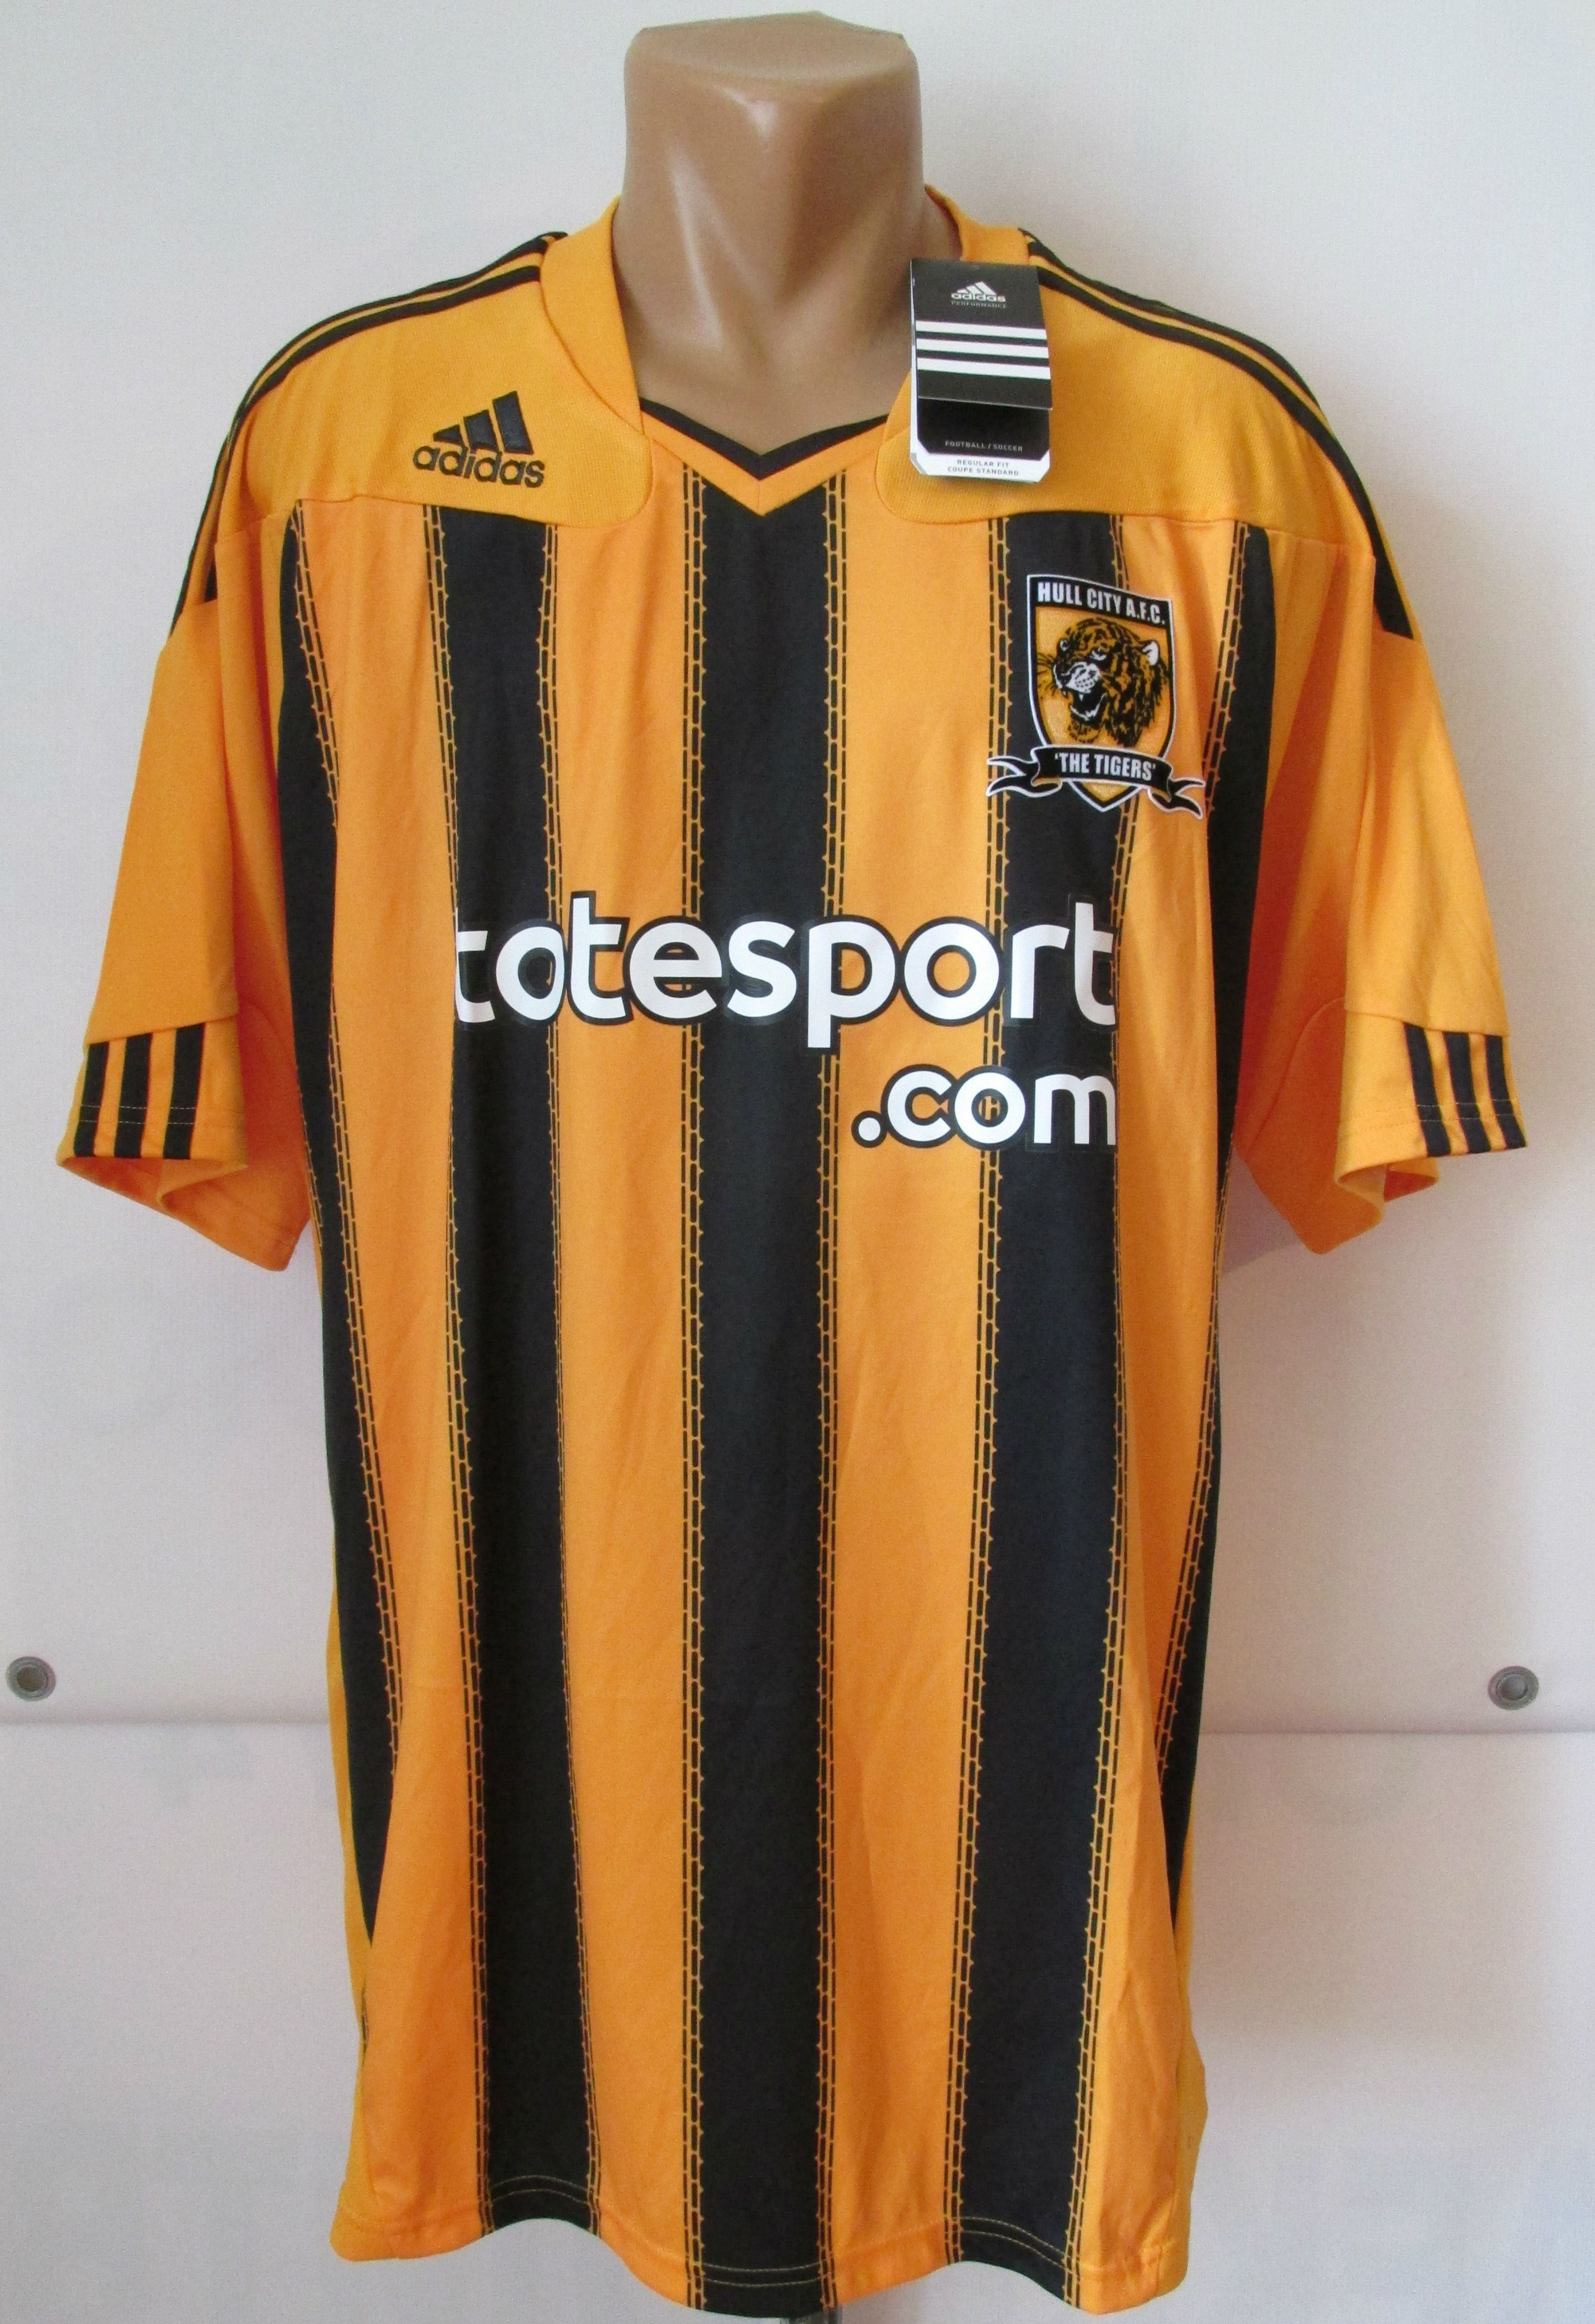 Hull City 2010 2011 home football shirt by Adidas England HCFC BNWT soccer  jersey new Tigers  Hull  HullCity  HCFC  tigers  england  new  adidas  bnwt  ... 1424a7997